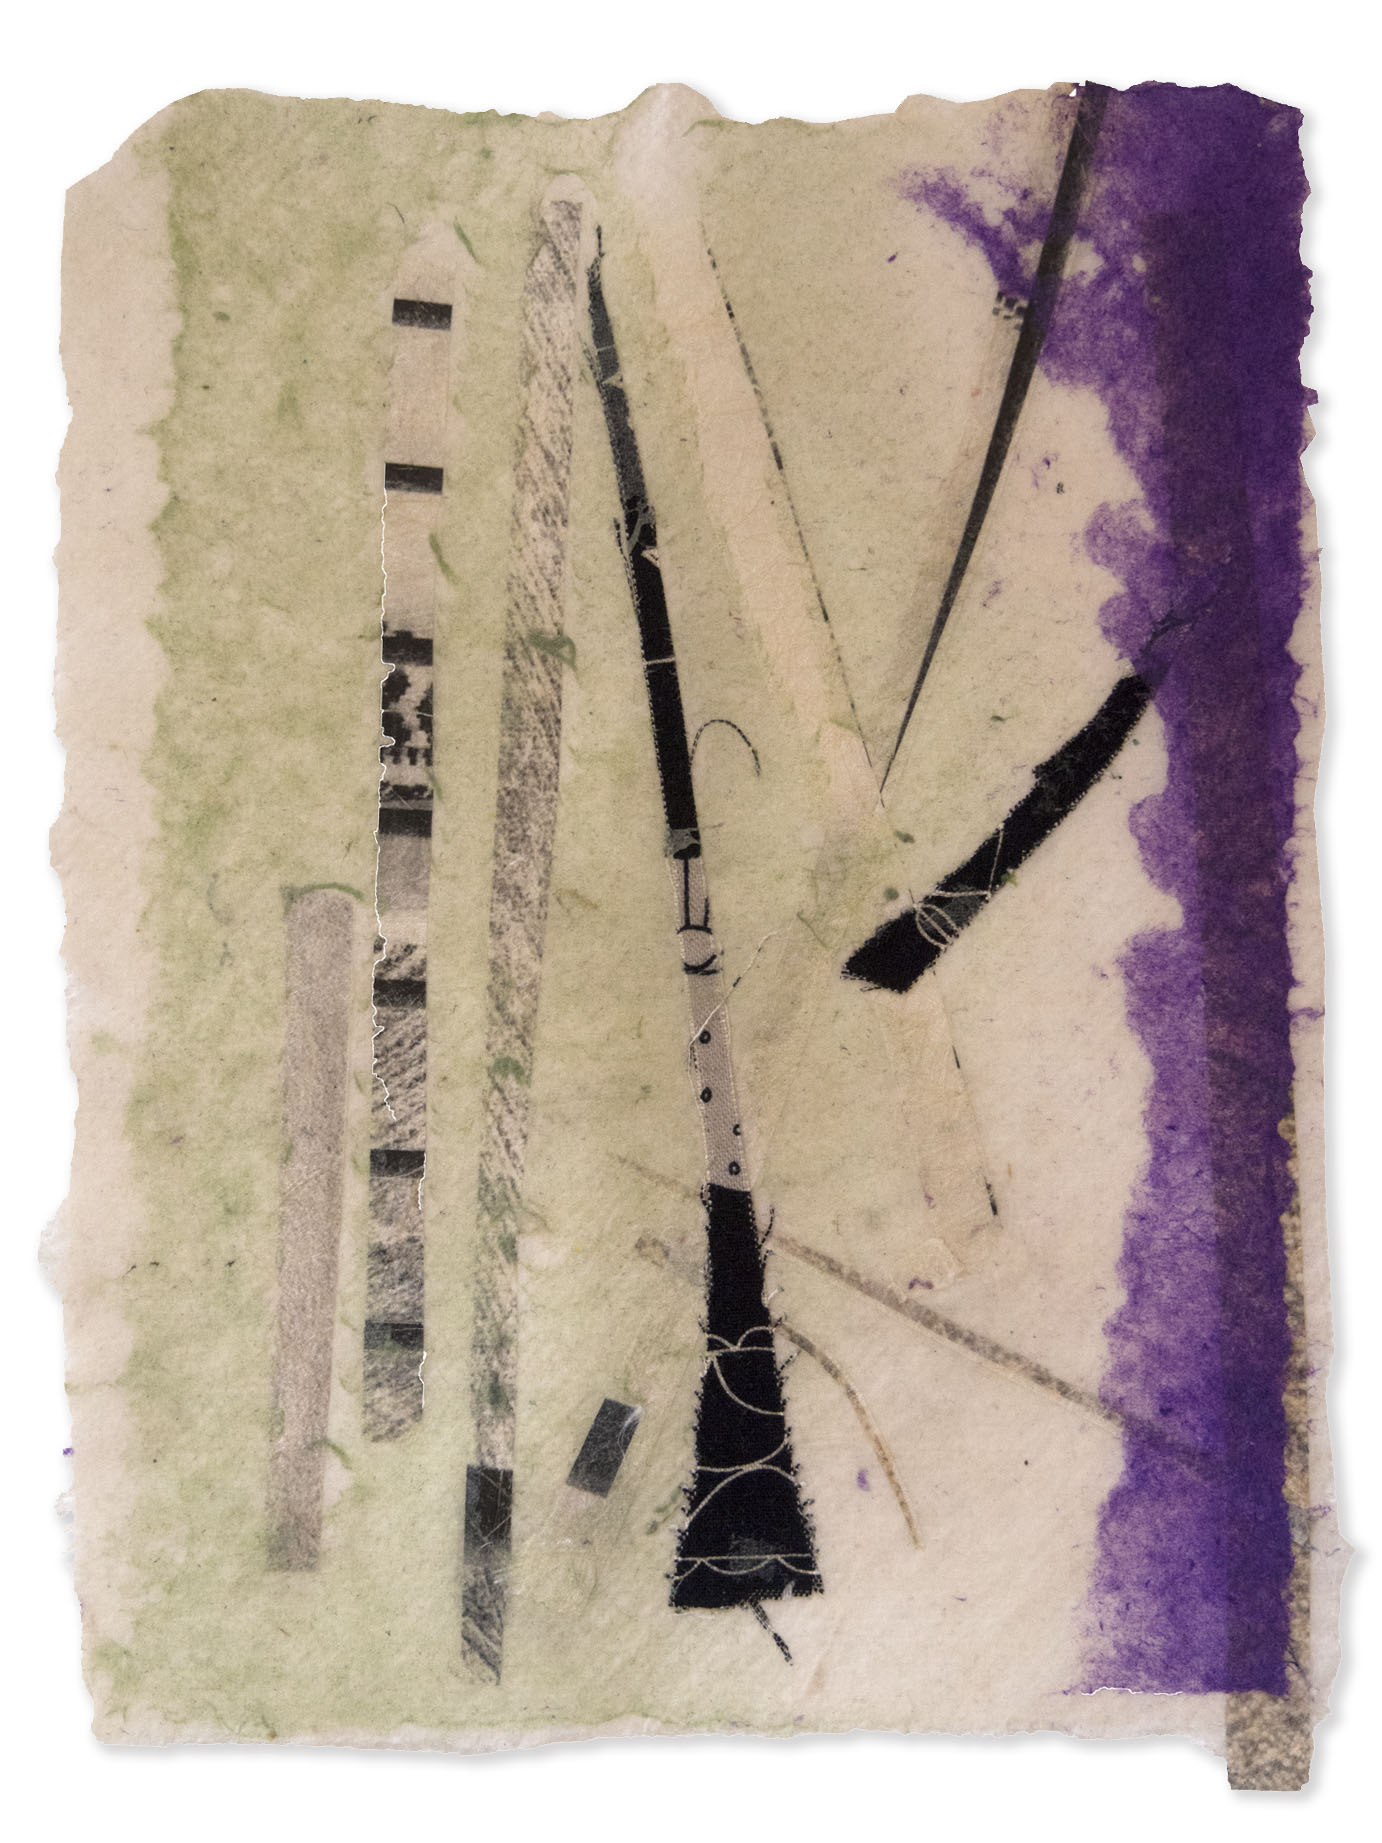 untitled pulp 1, 2014